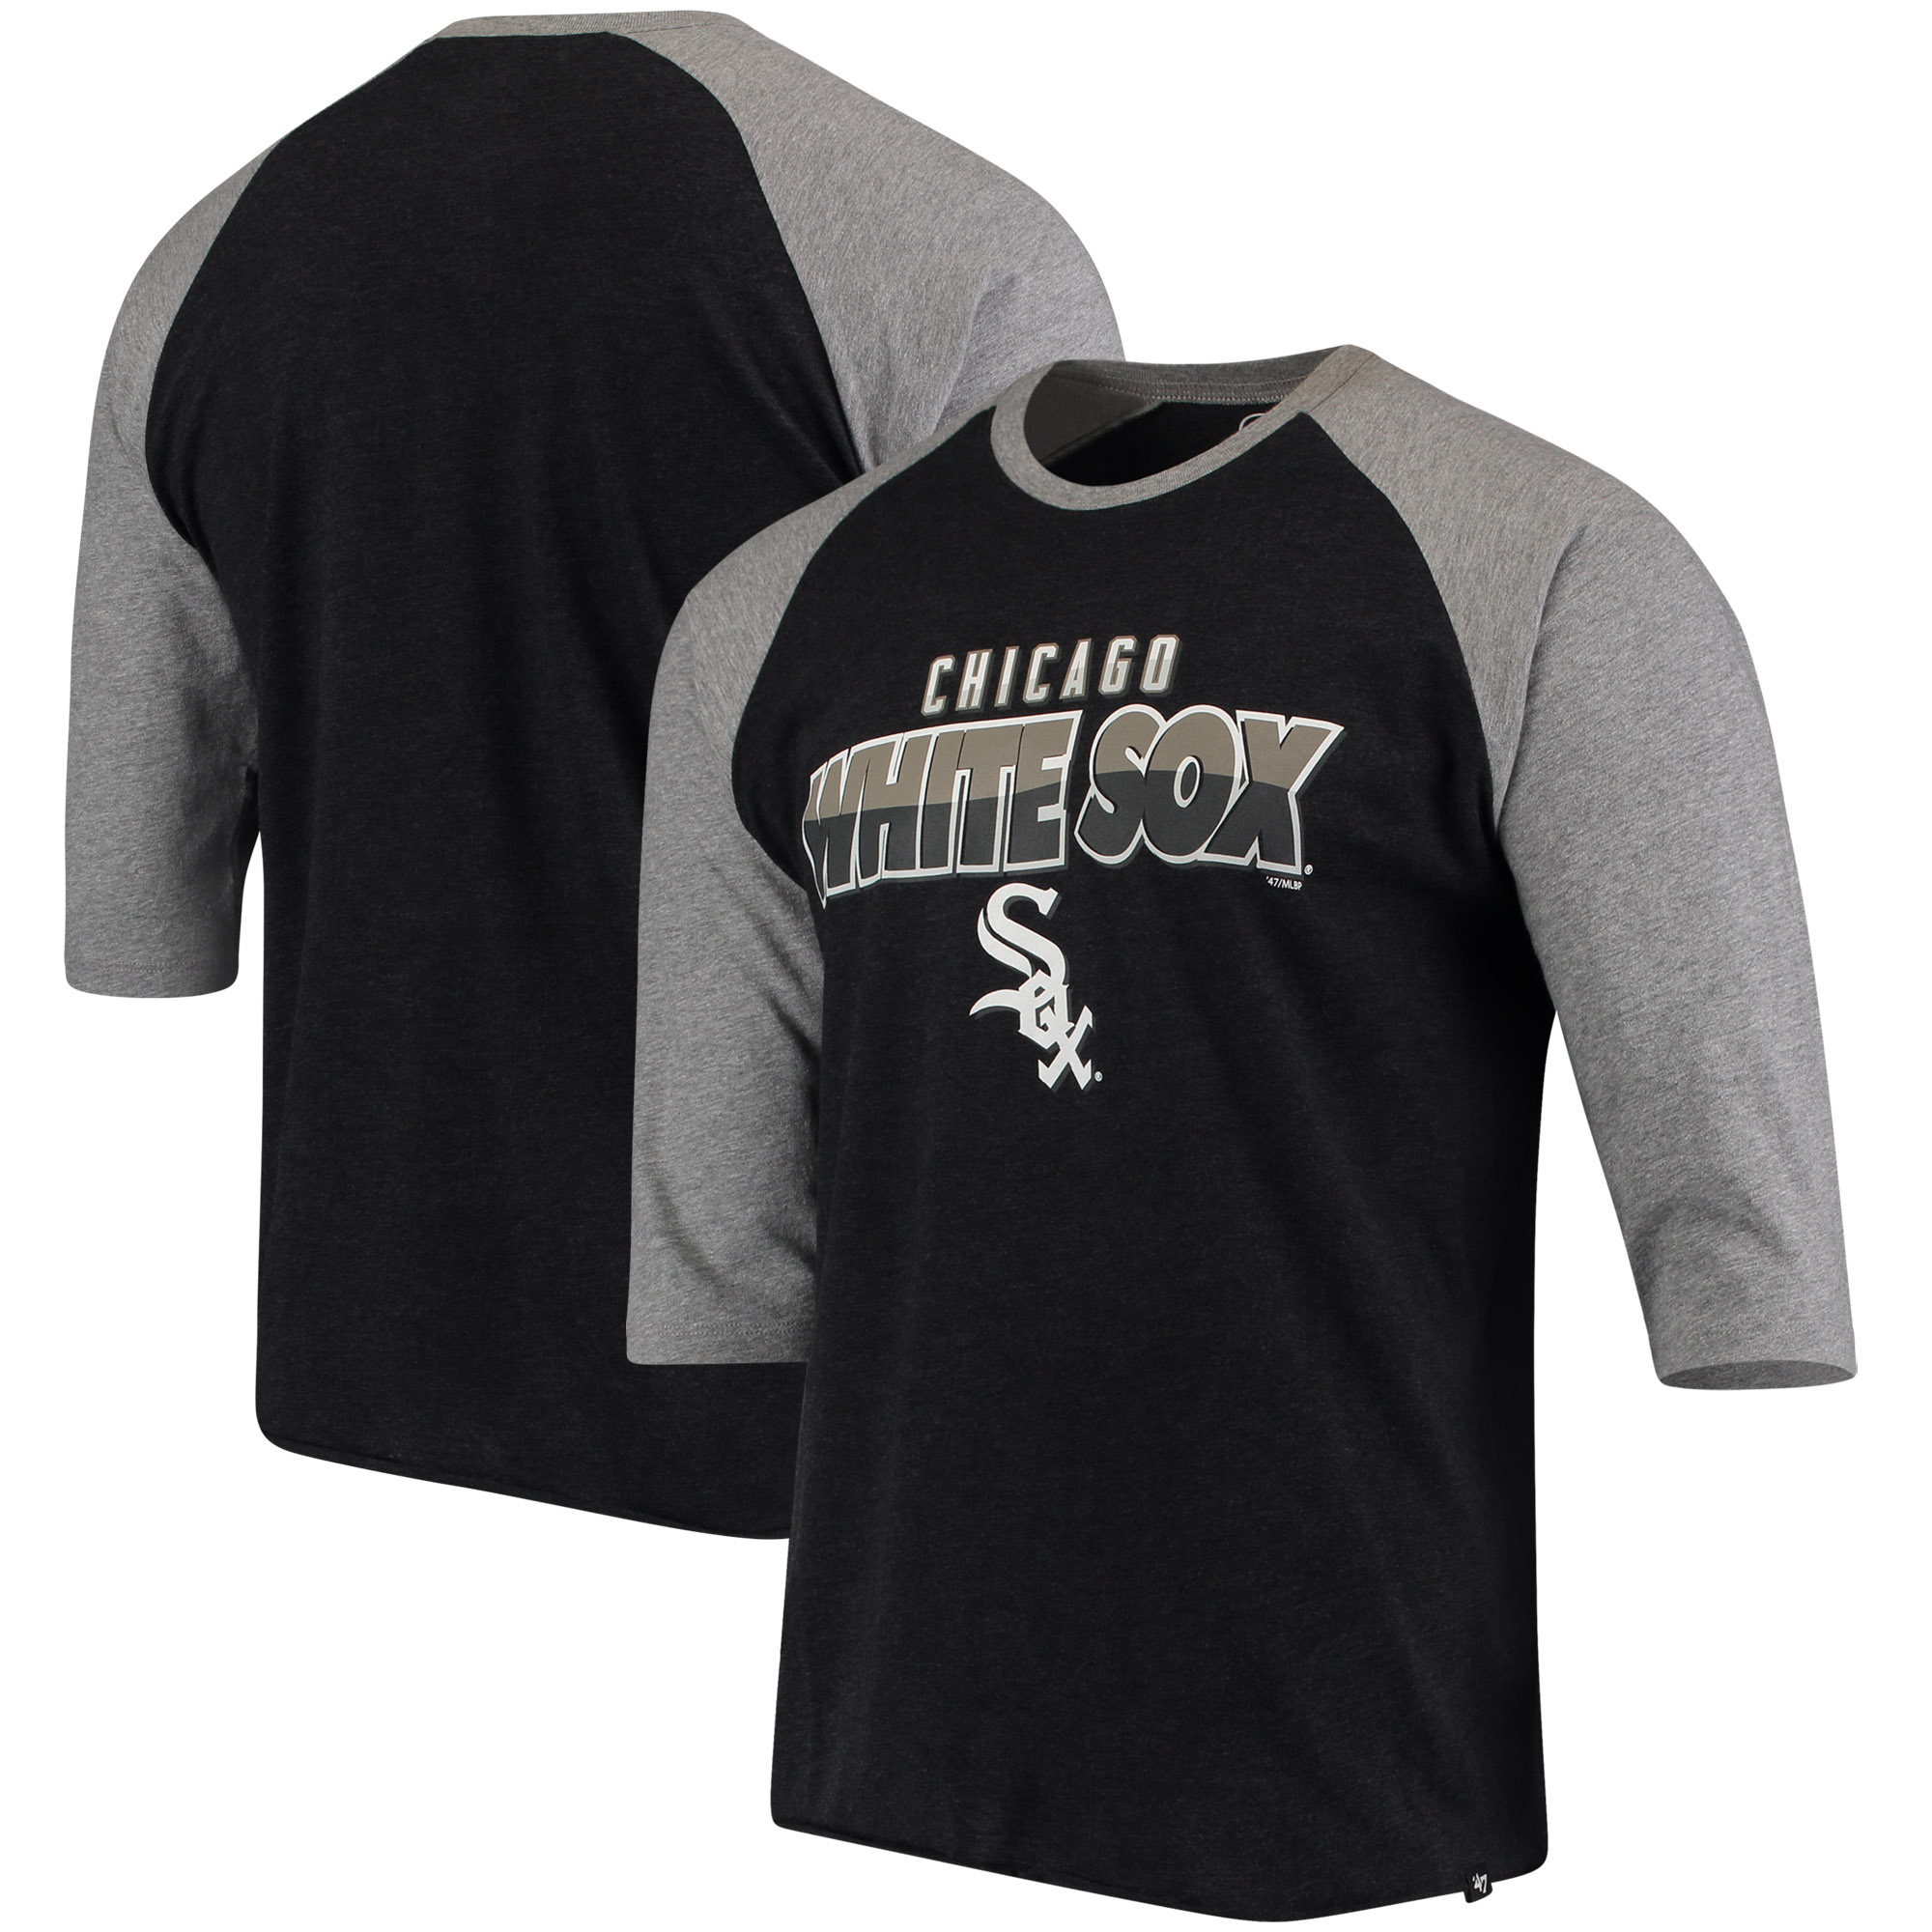 Chicago White Sox '47 Club 3/4-Sleeve Raglan T-Shirt - Black